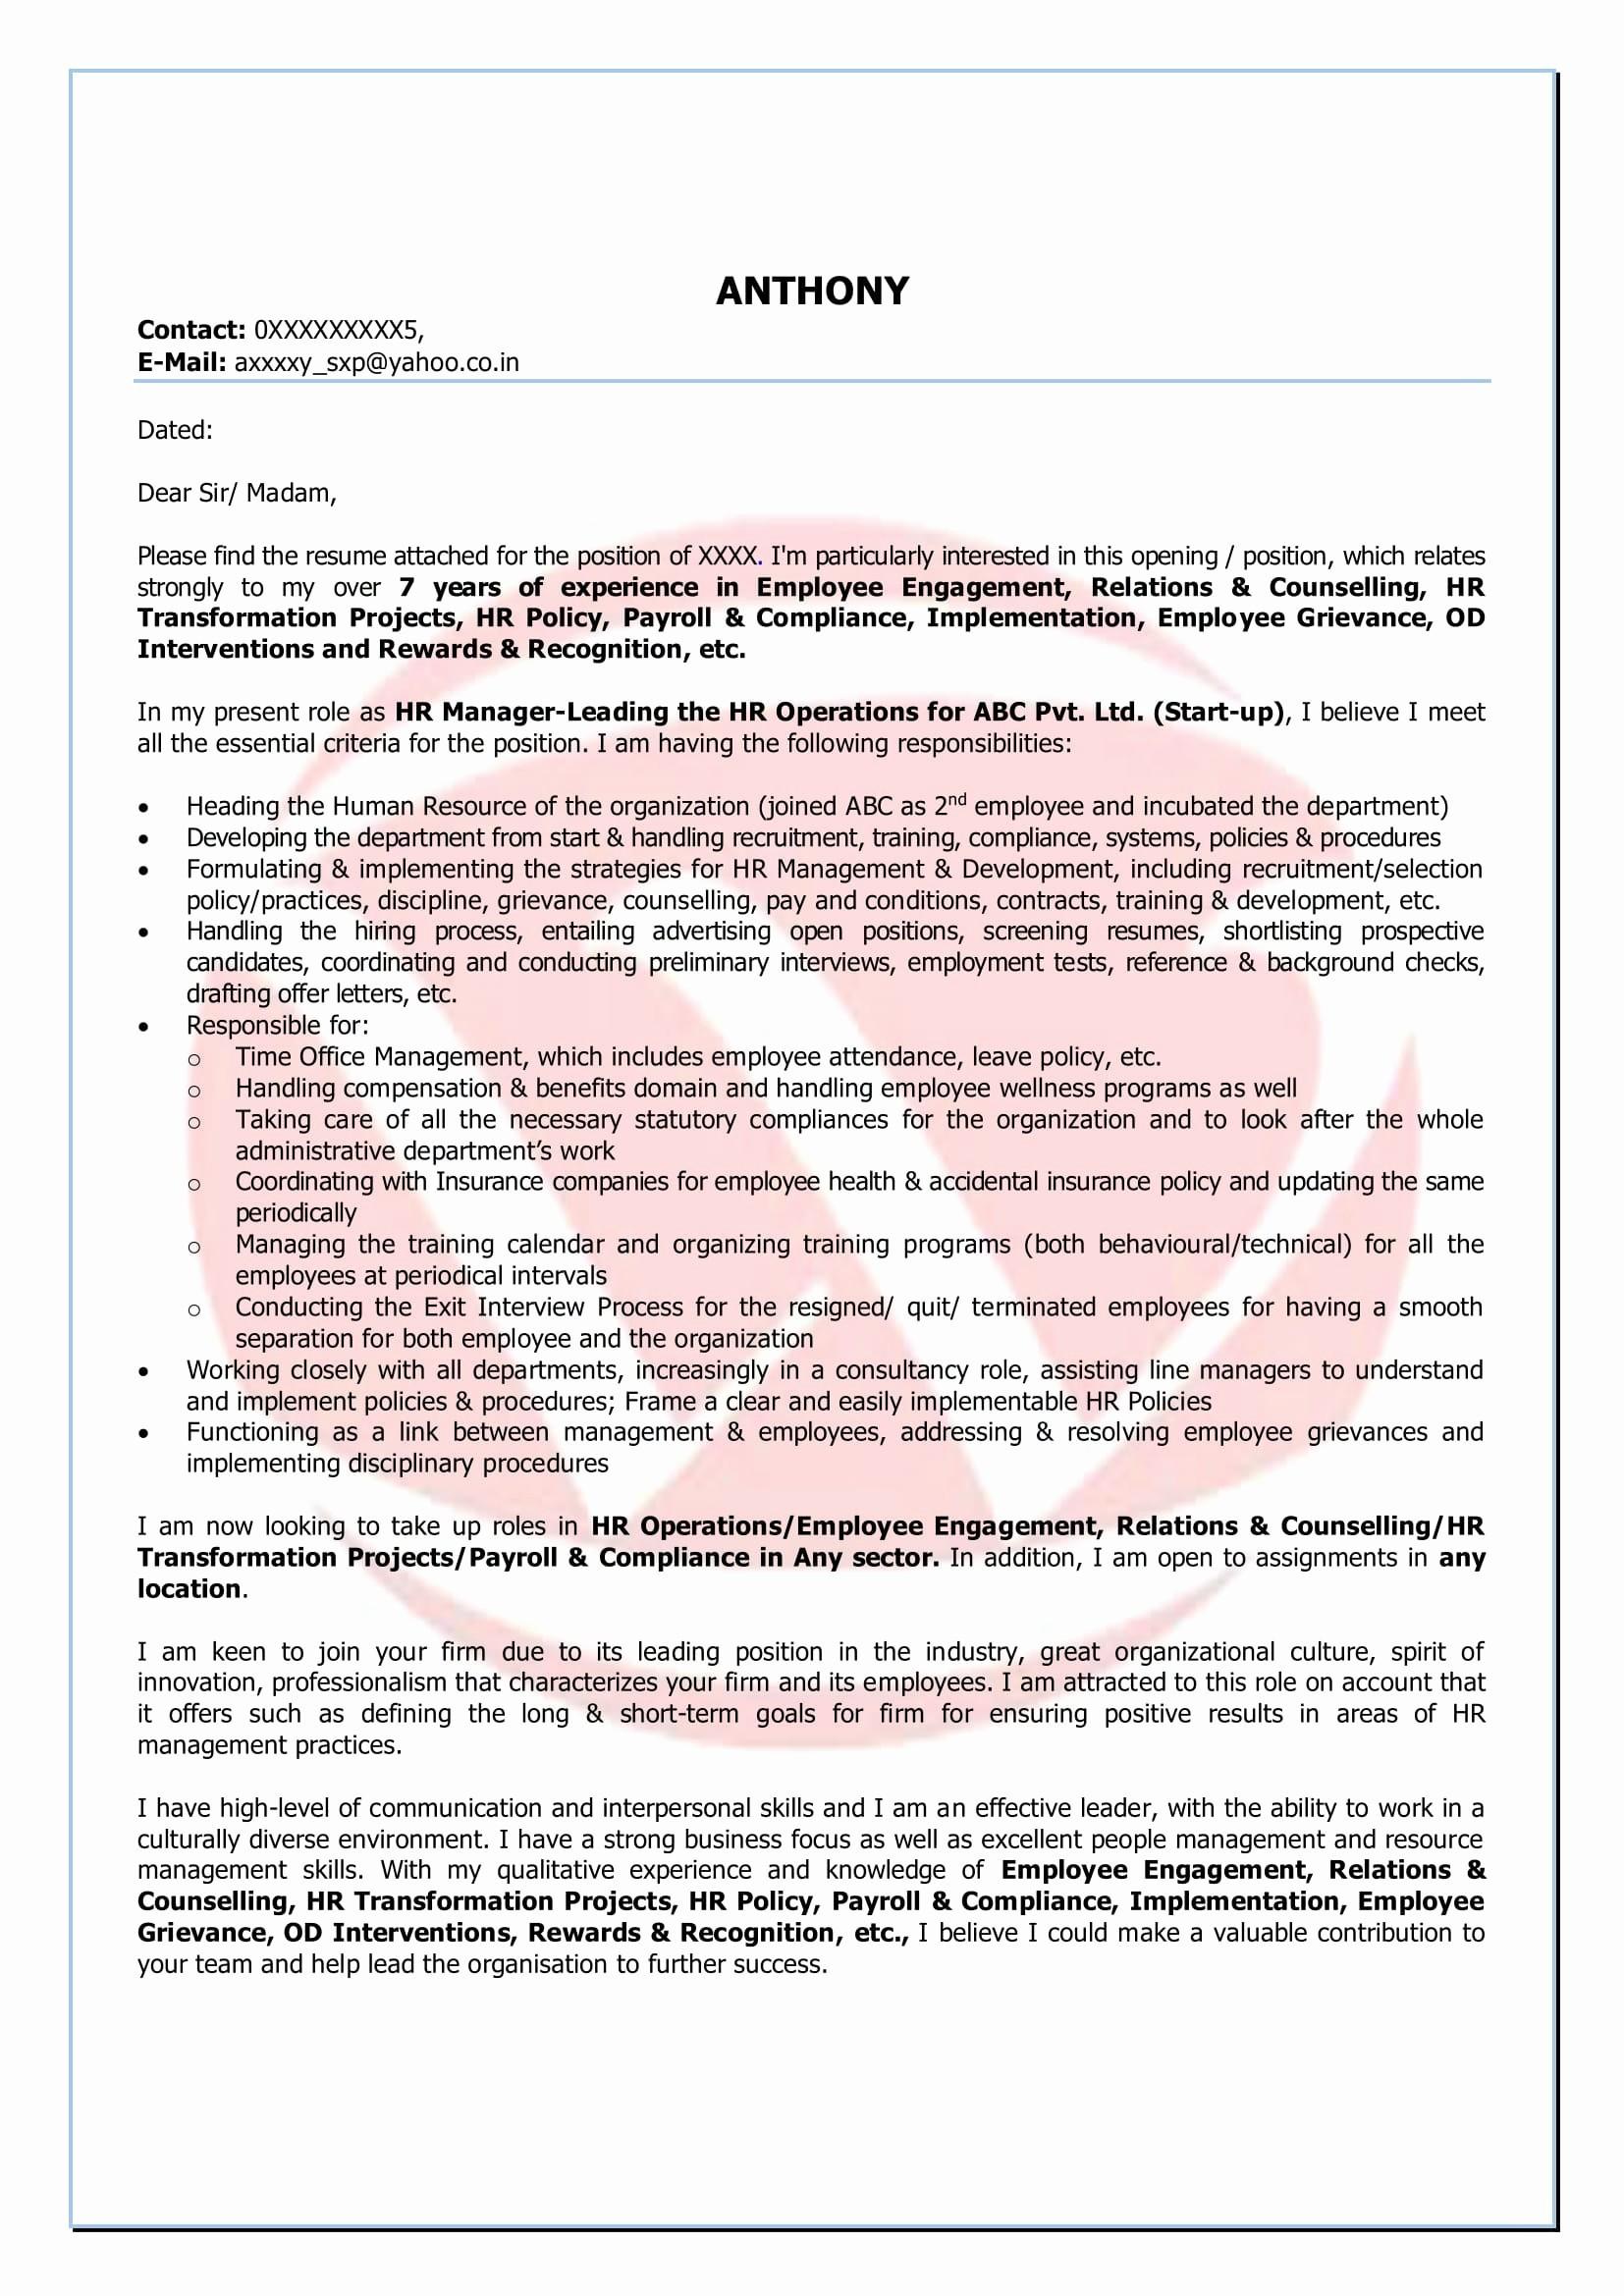 401k Enrollment Form Template Www Topsimages Com